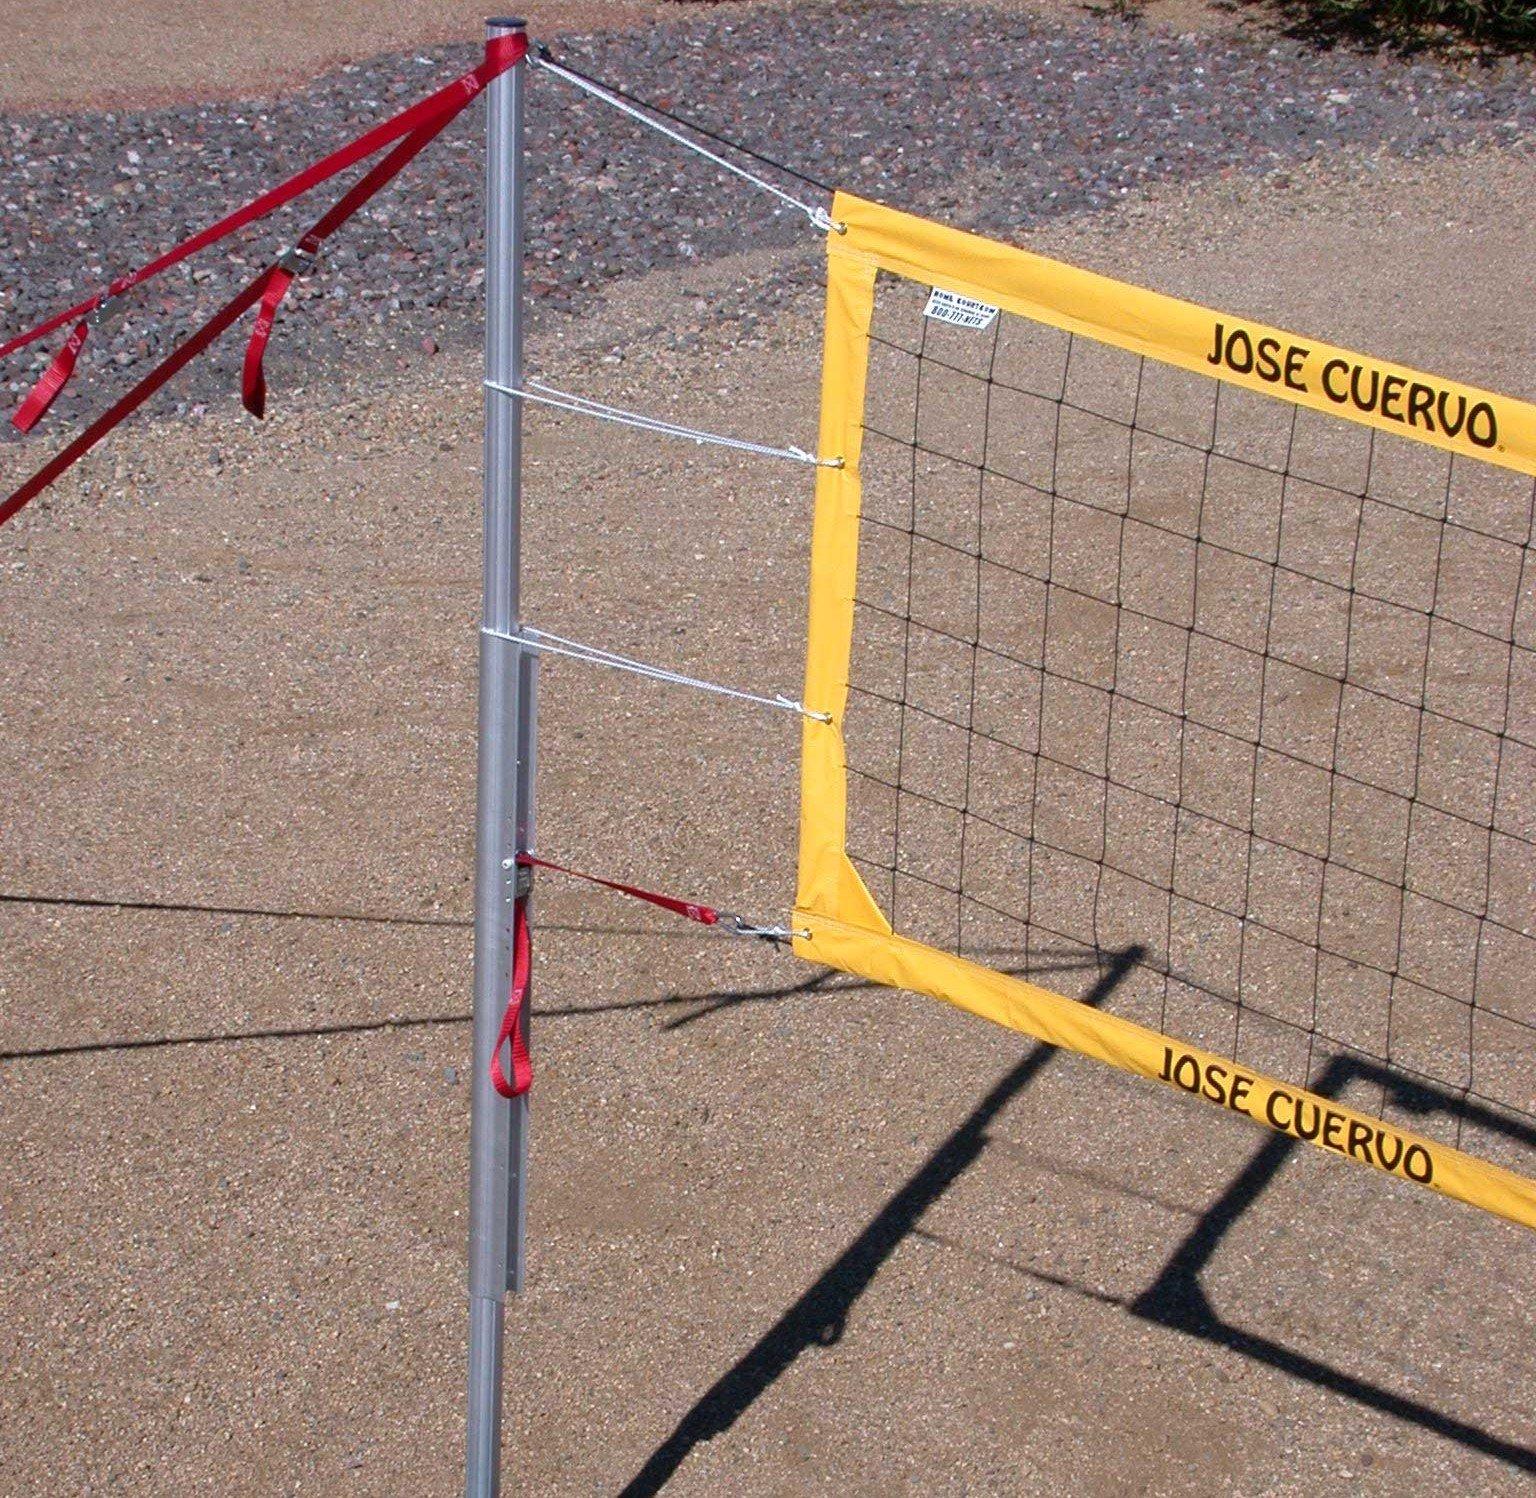 Home Court JCCNR201-W25Y Pro Court Volleyball Set